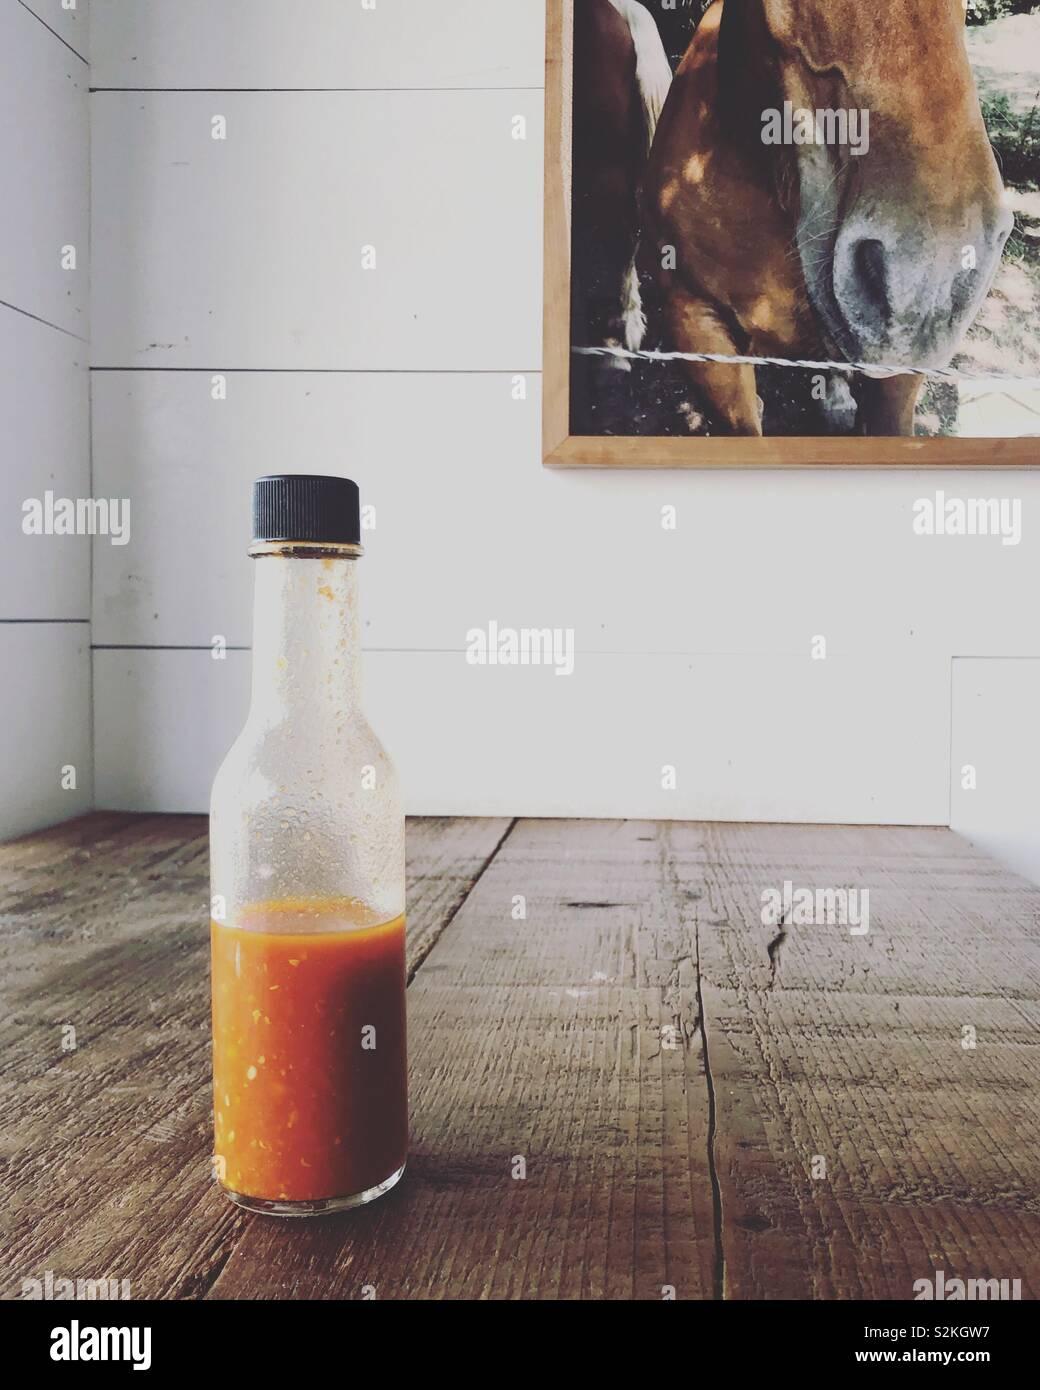 Caballo y salsa picante Foto de stock